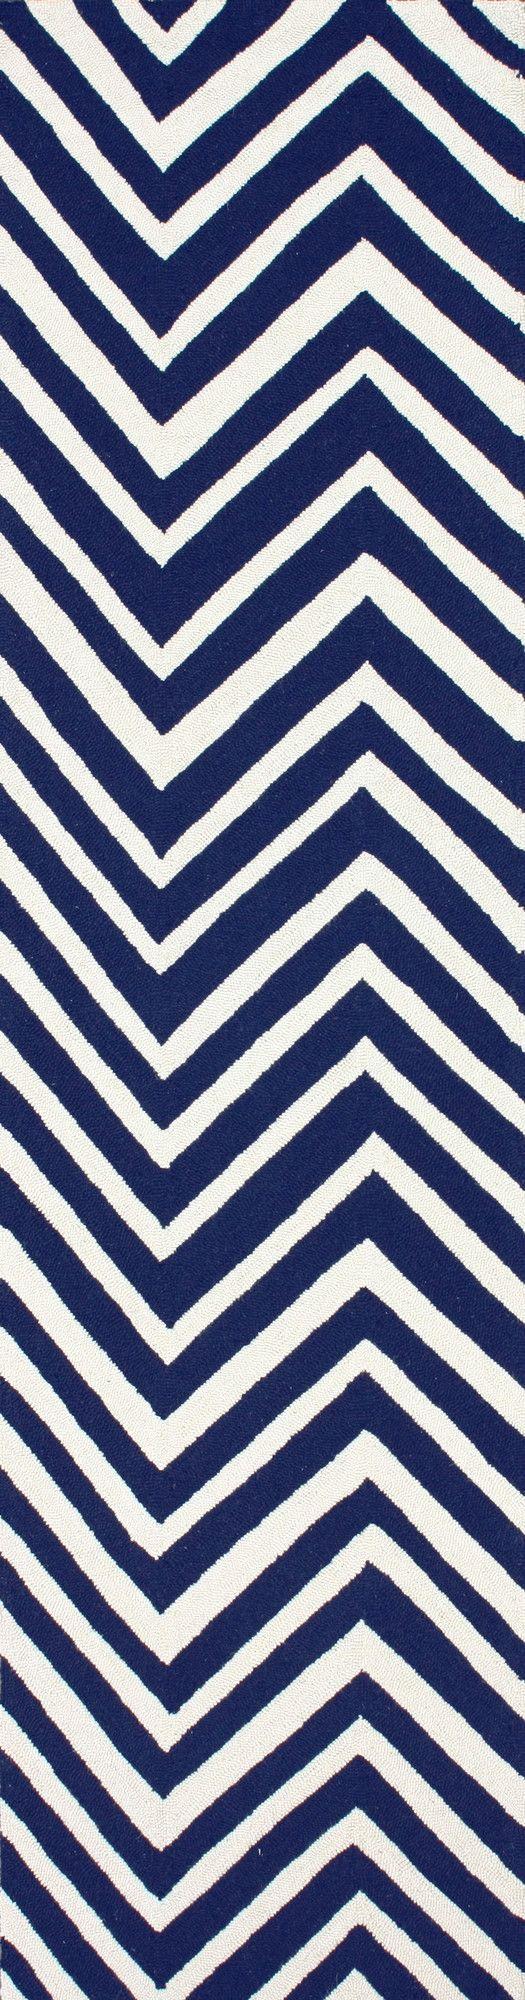 Chelsea Navy Blue/White Chevron Area Rug